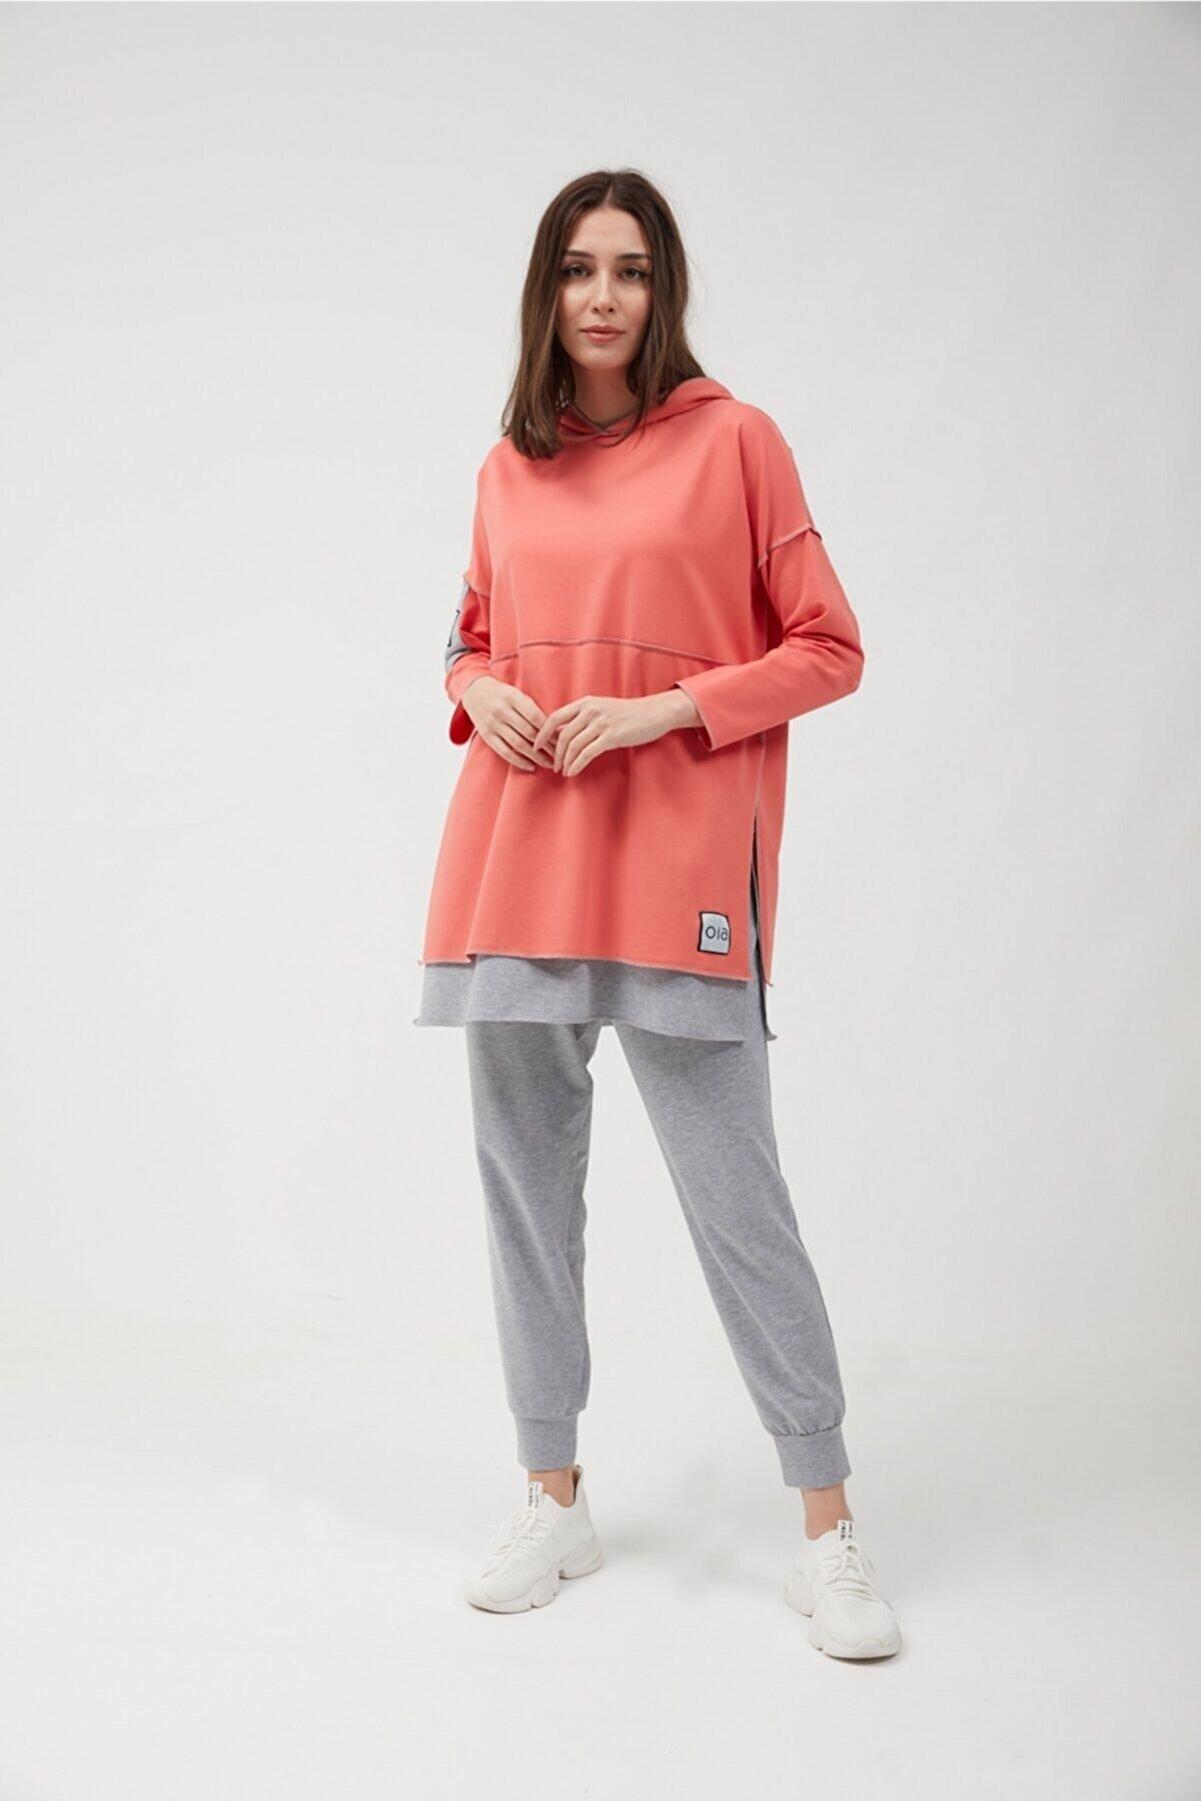 oia Kadın  Karides Pamuklu Tunik Pantolon Takım Eşofman Takım W-0900